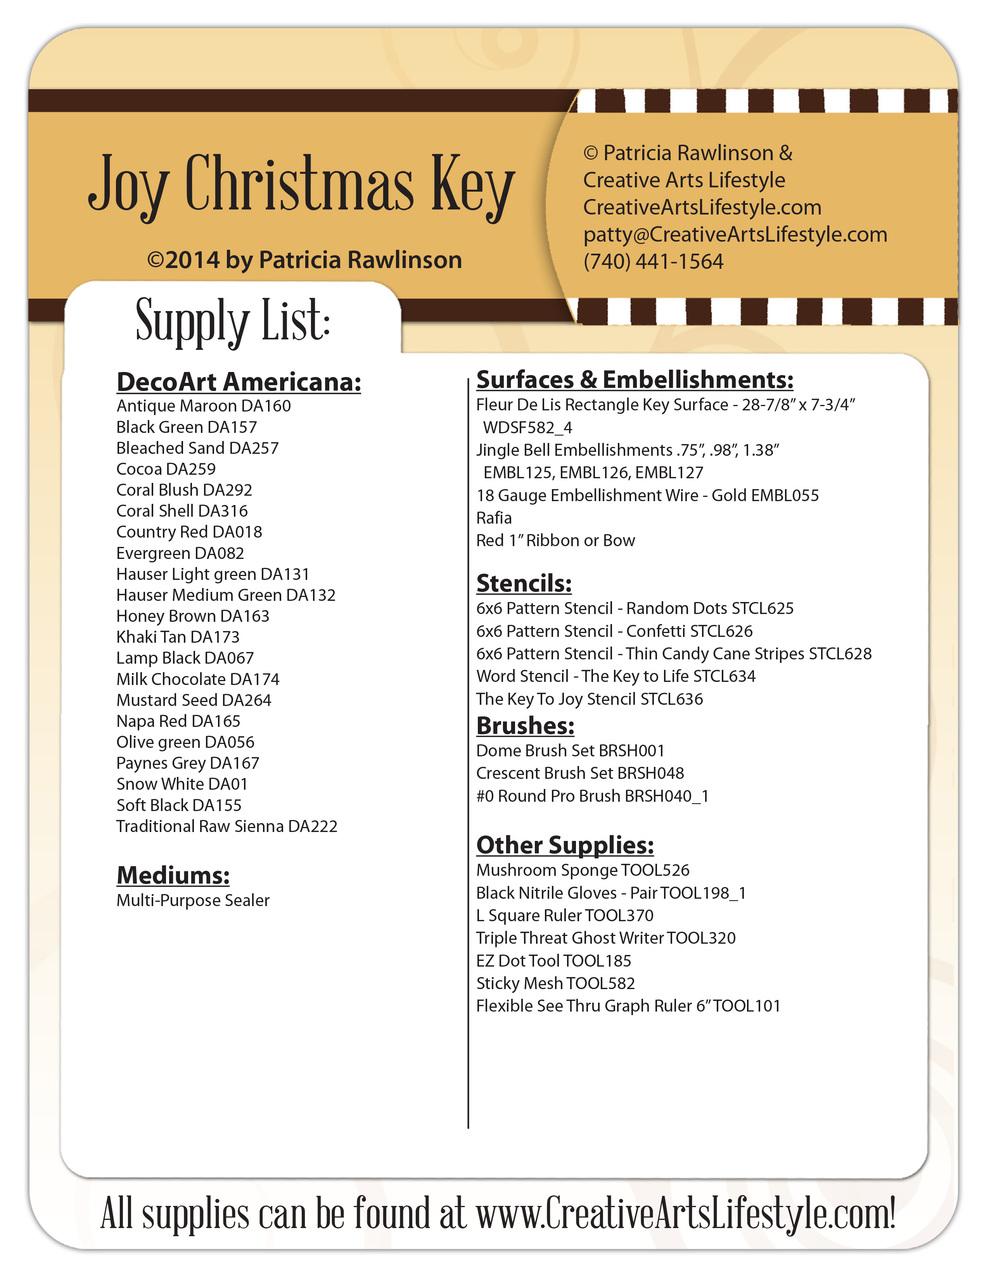 Joy Christmas Key DVD + E-Packet